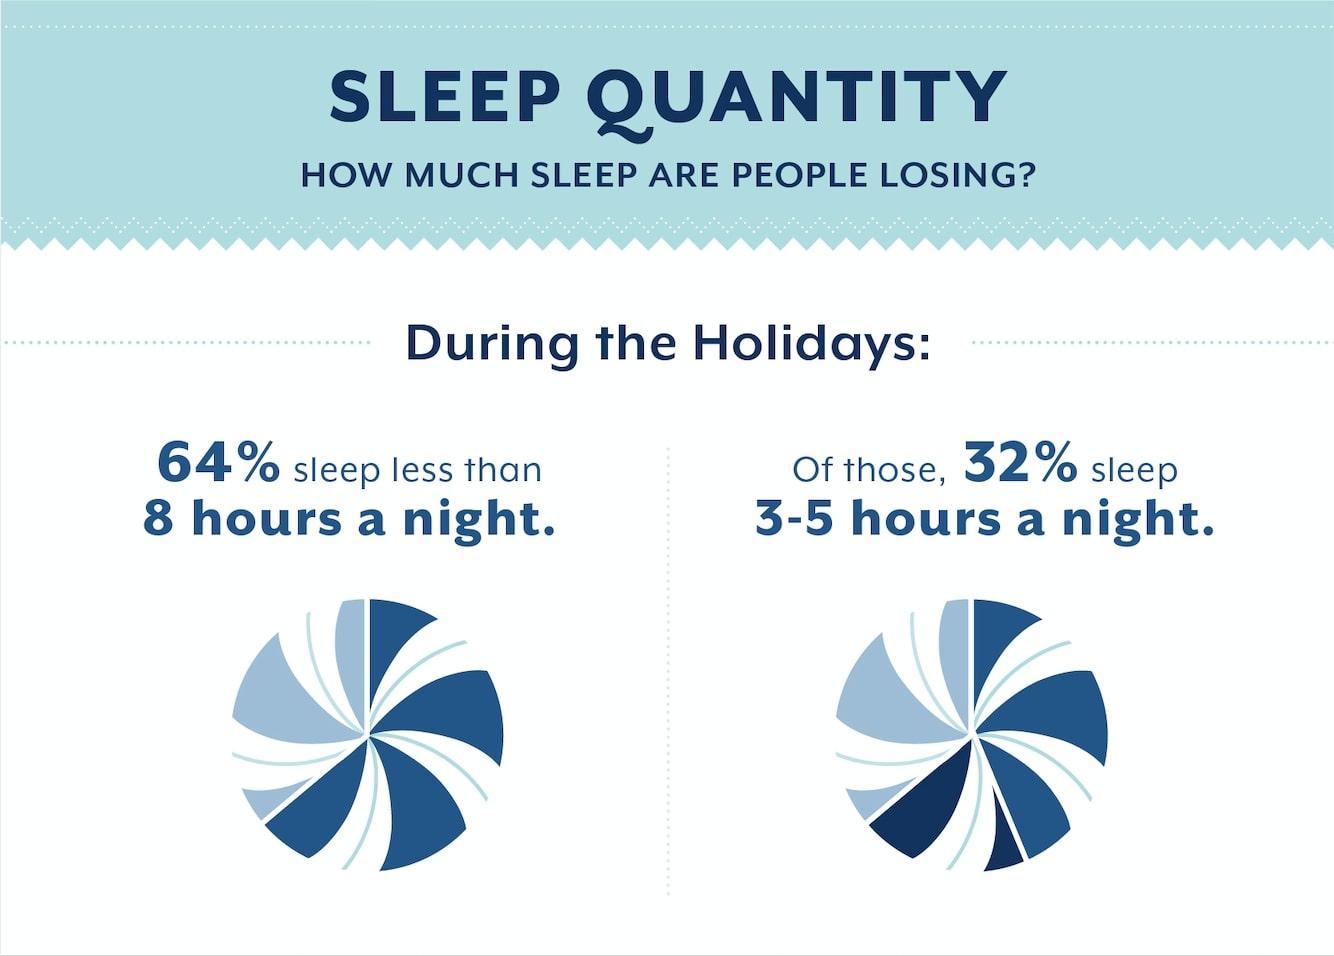 Holiday sleep quantity